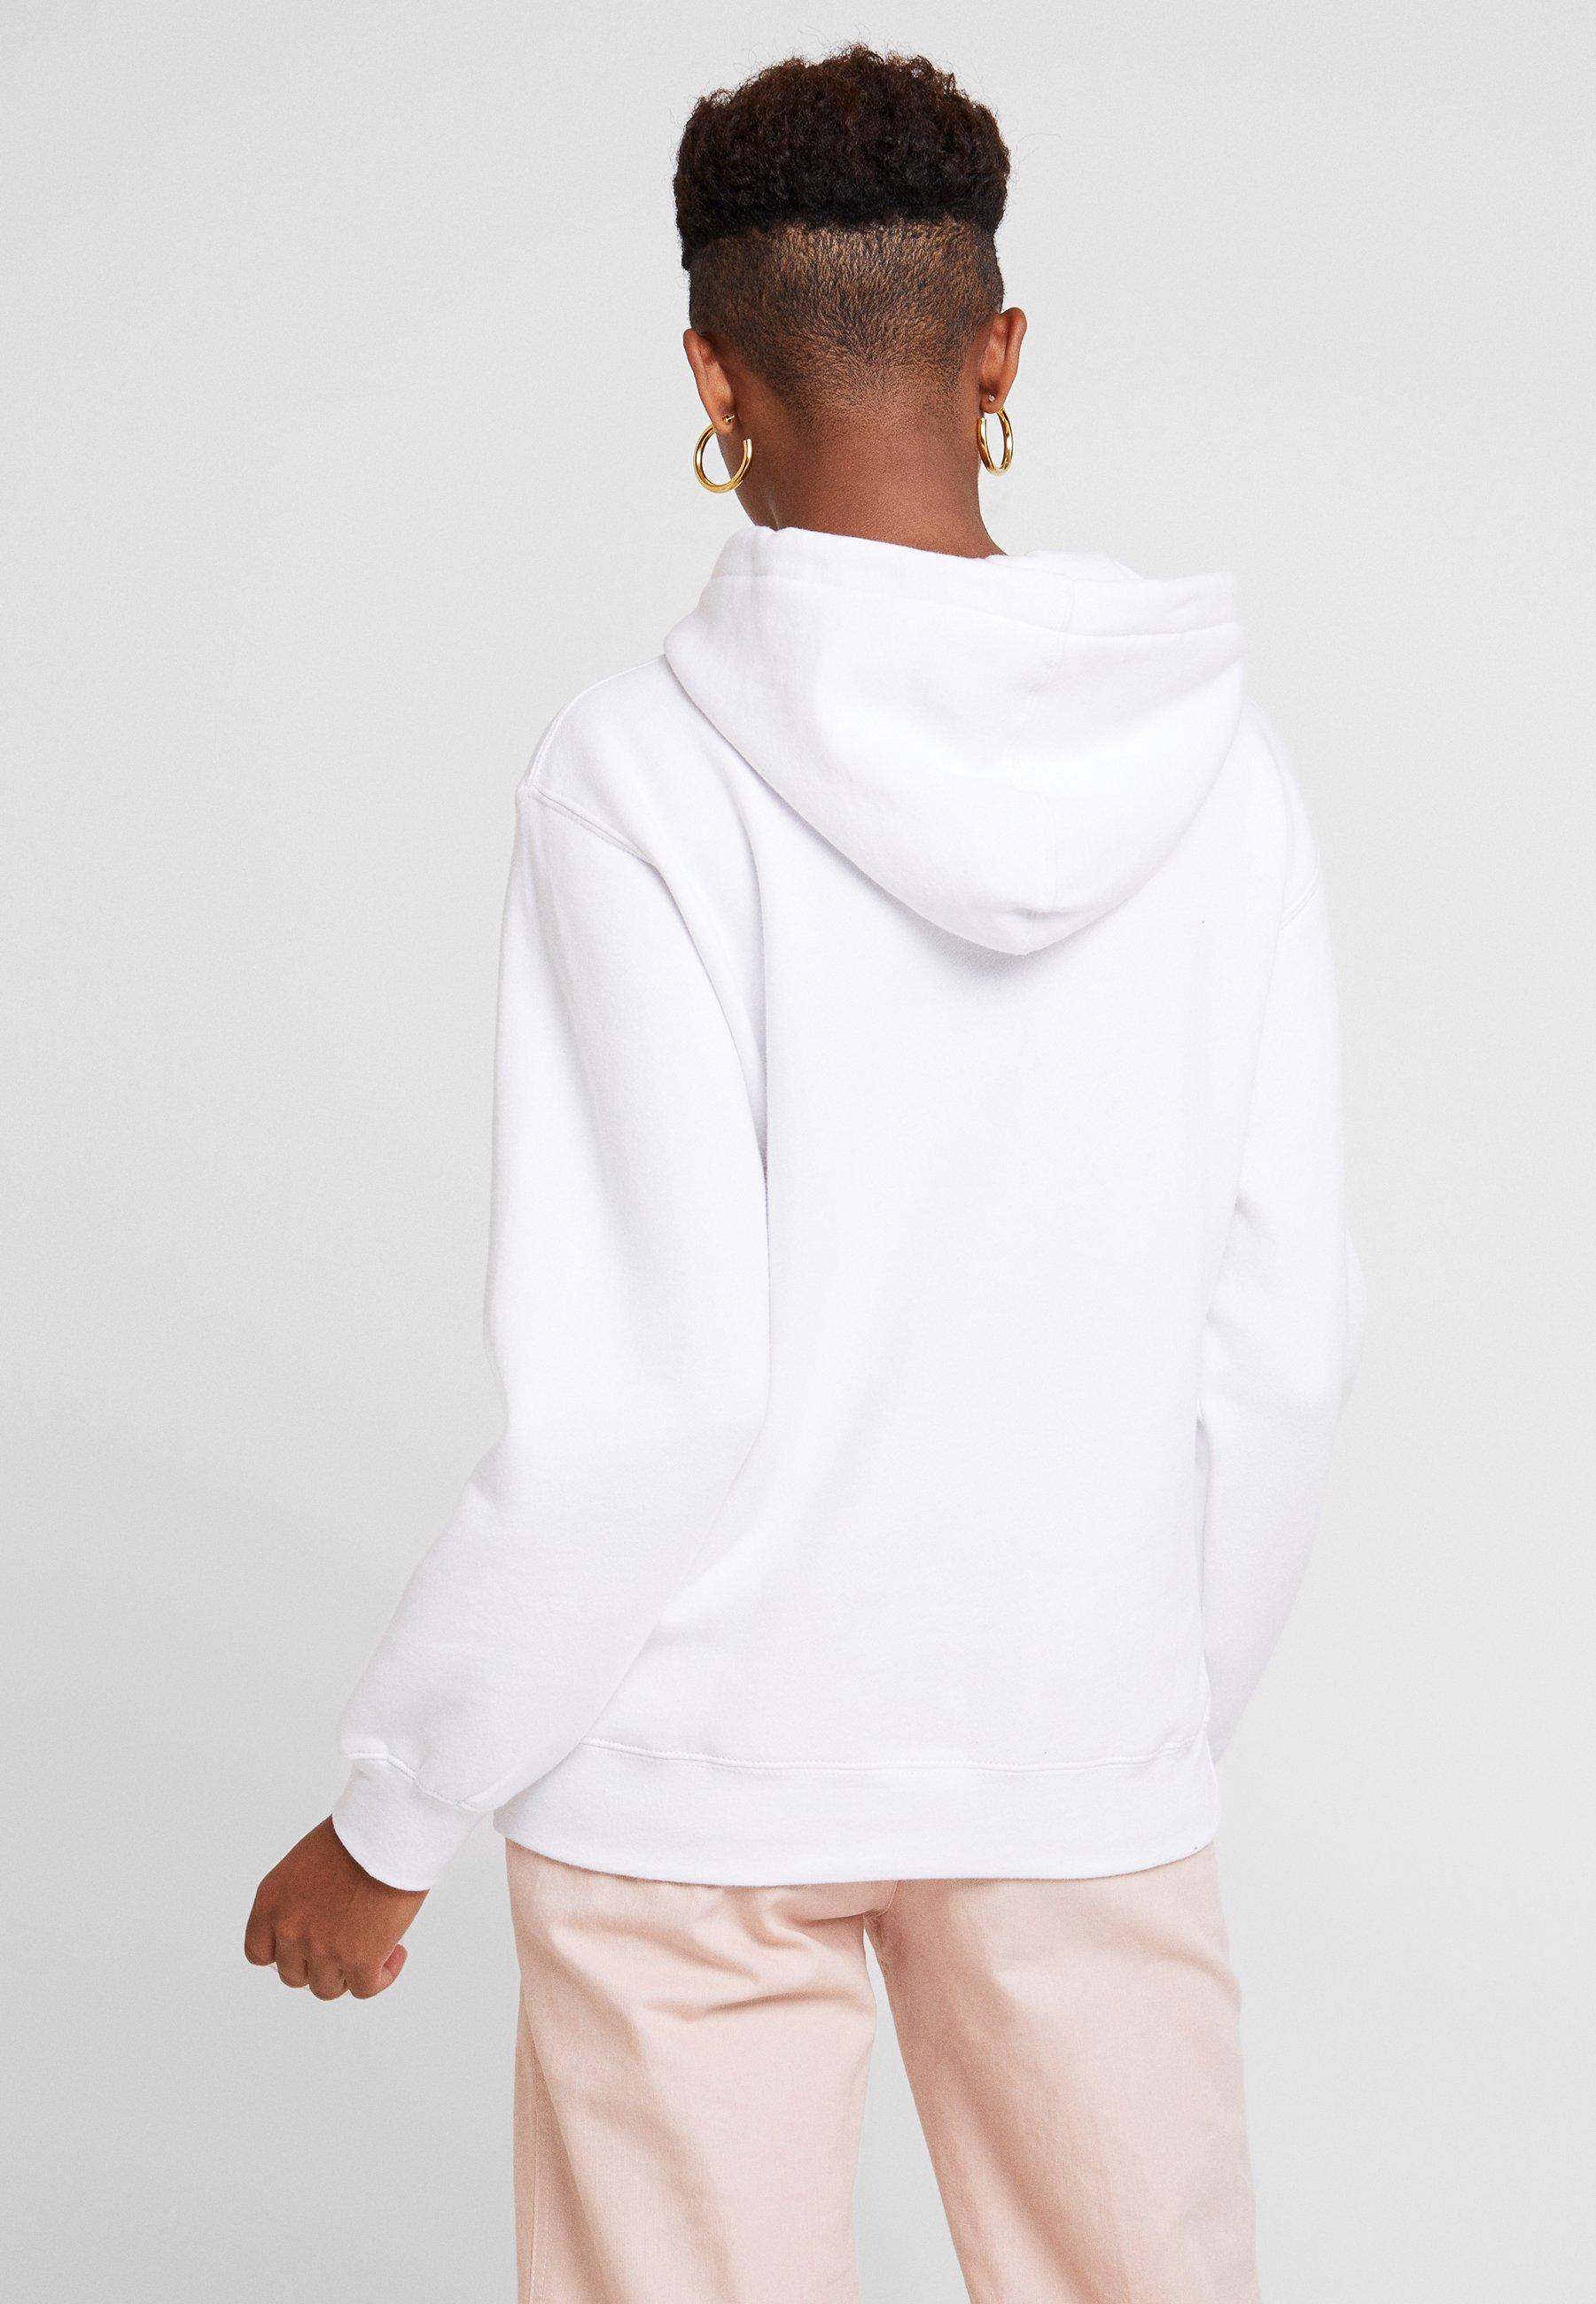 Clothing Capuche White Obey À MausoleumSweat SUMzpGLqjV